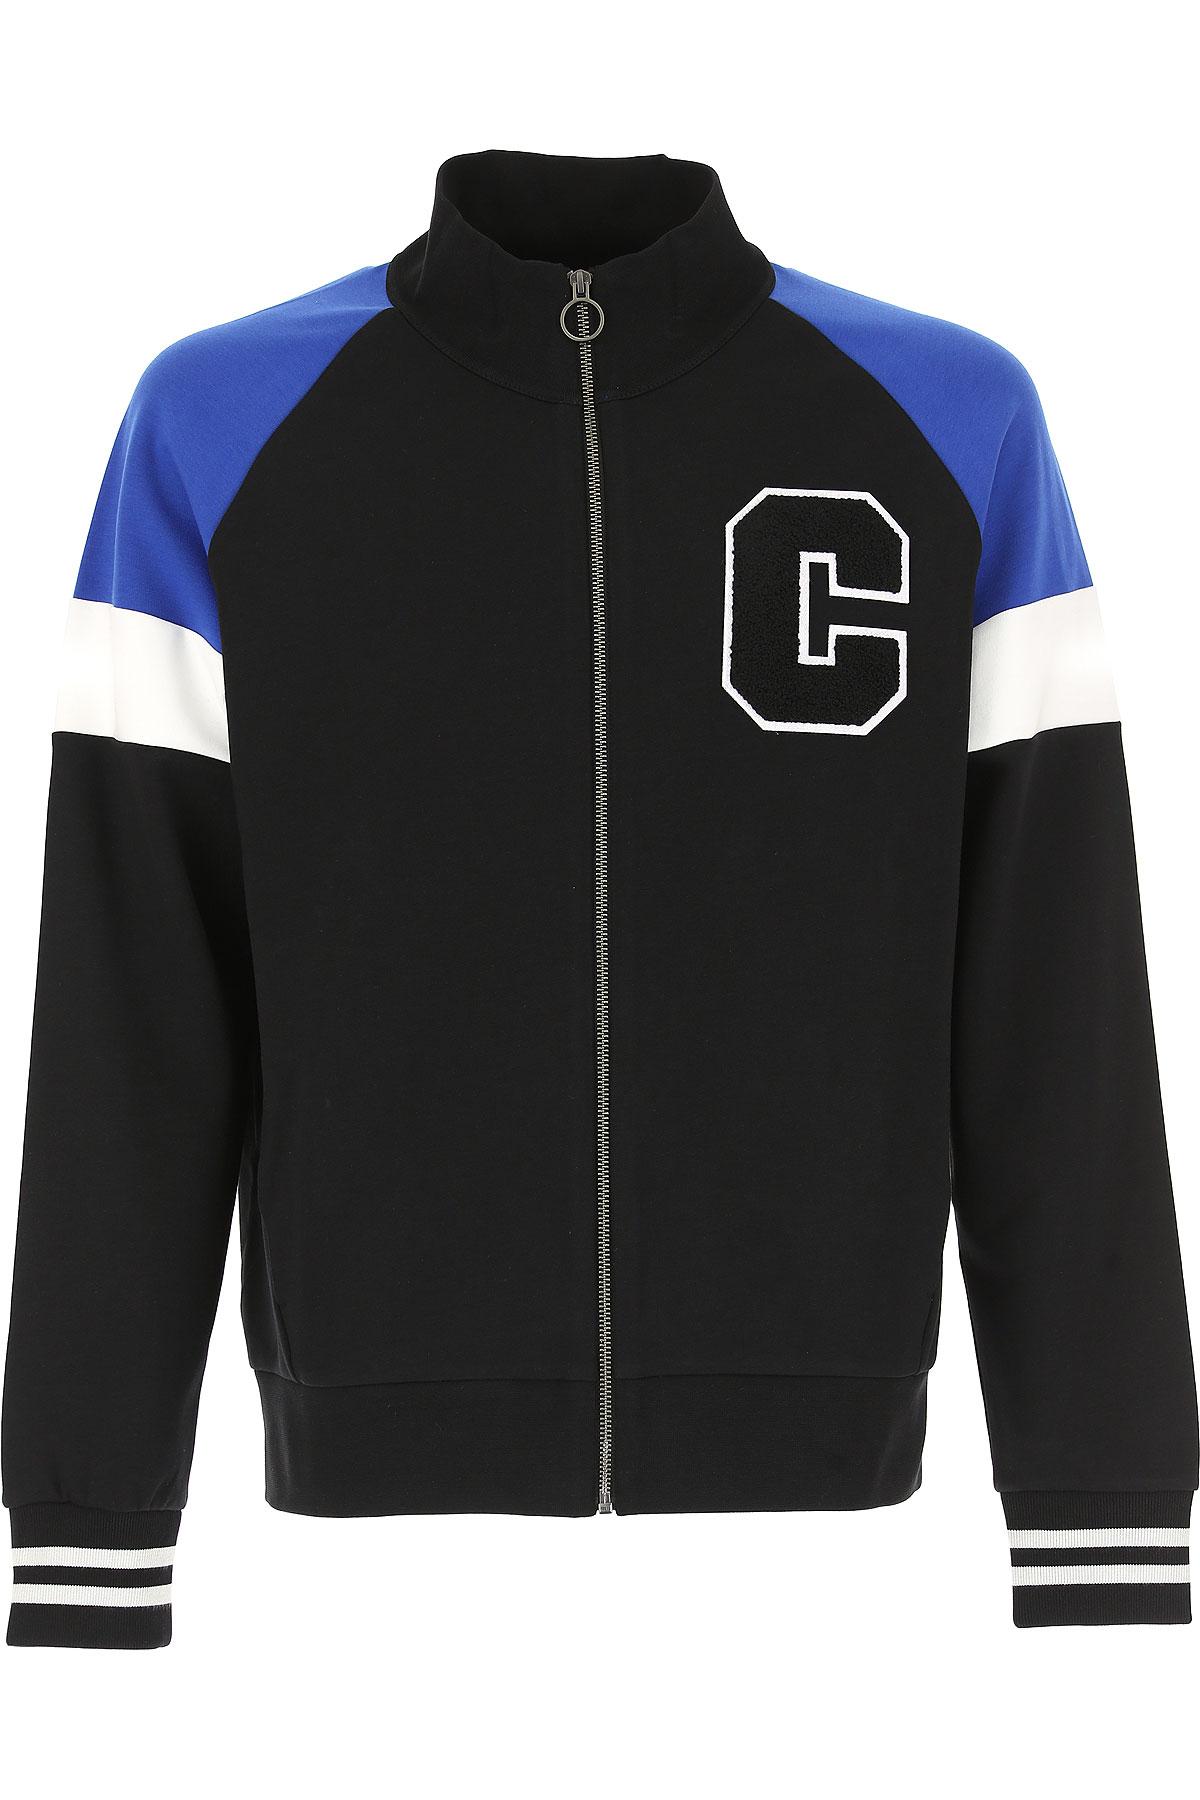 Calvin Klein Sweatshirt for Men, Black, Cotton, 2017, L M S XL USA-467665